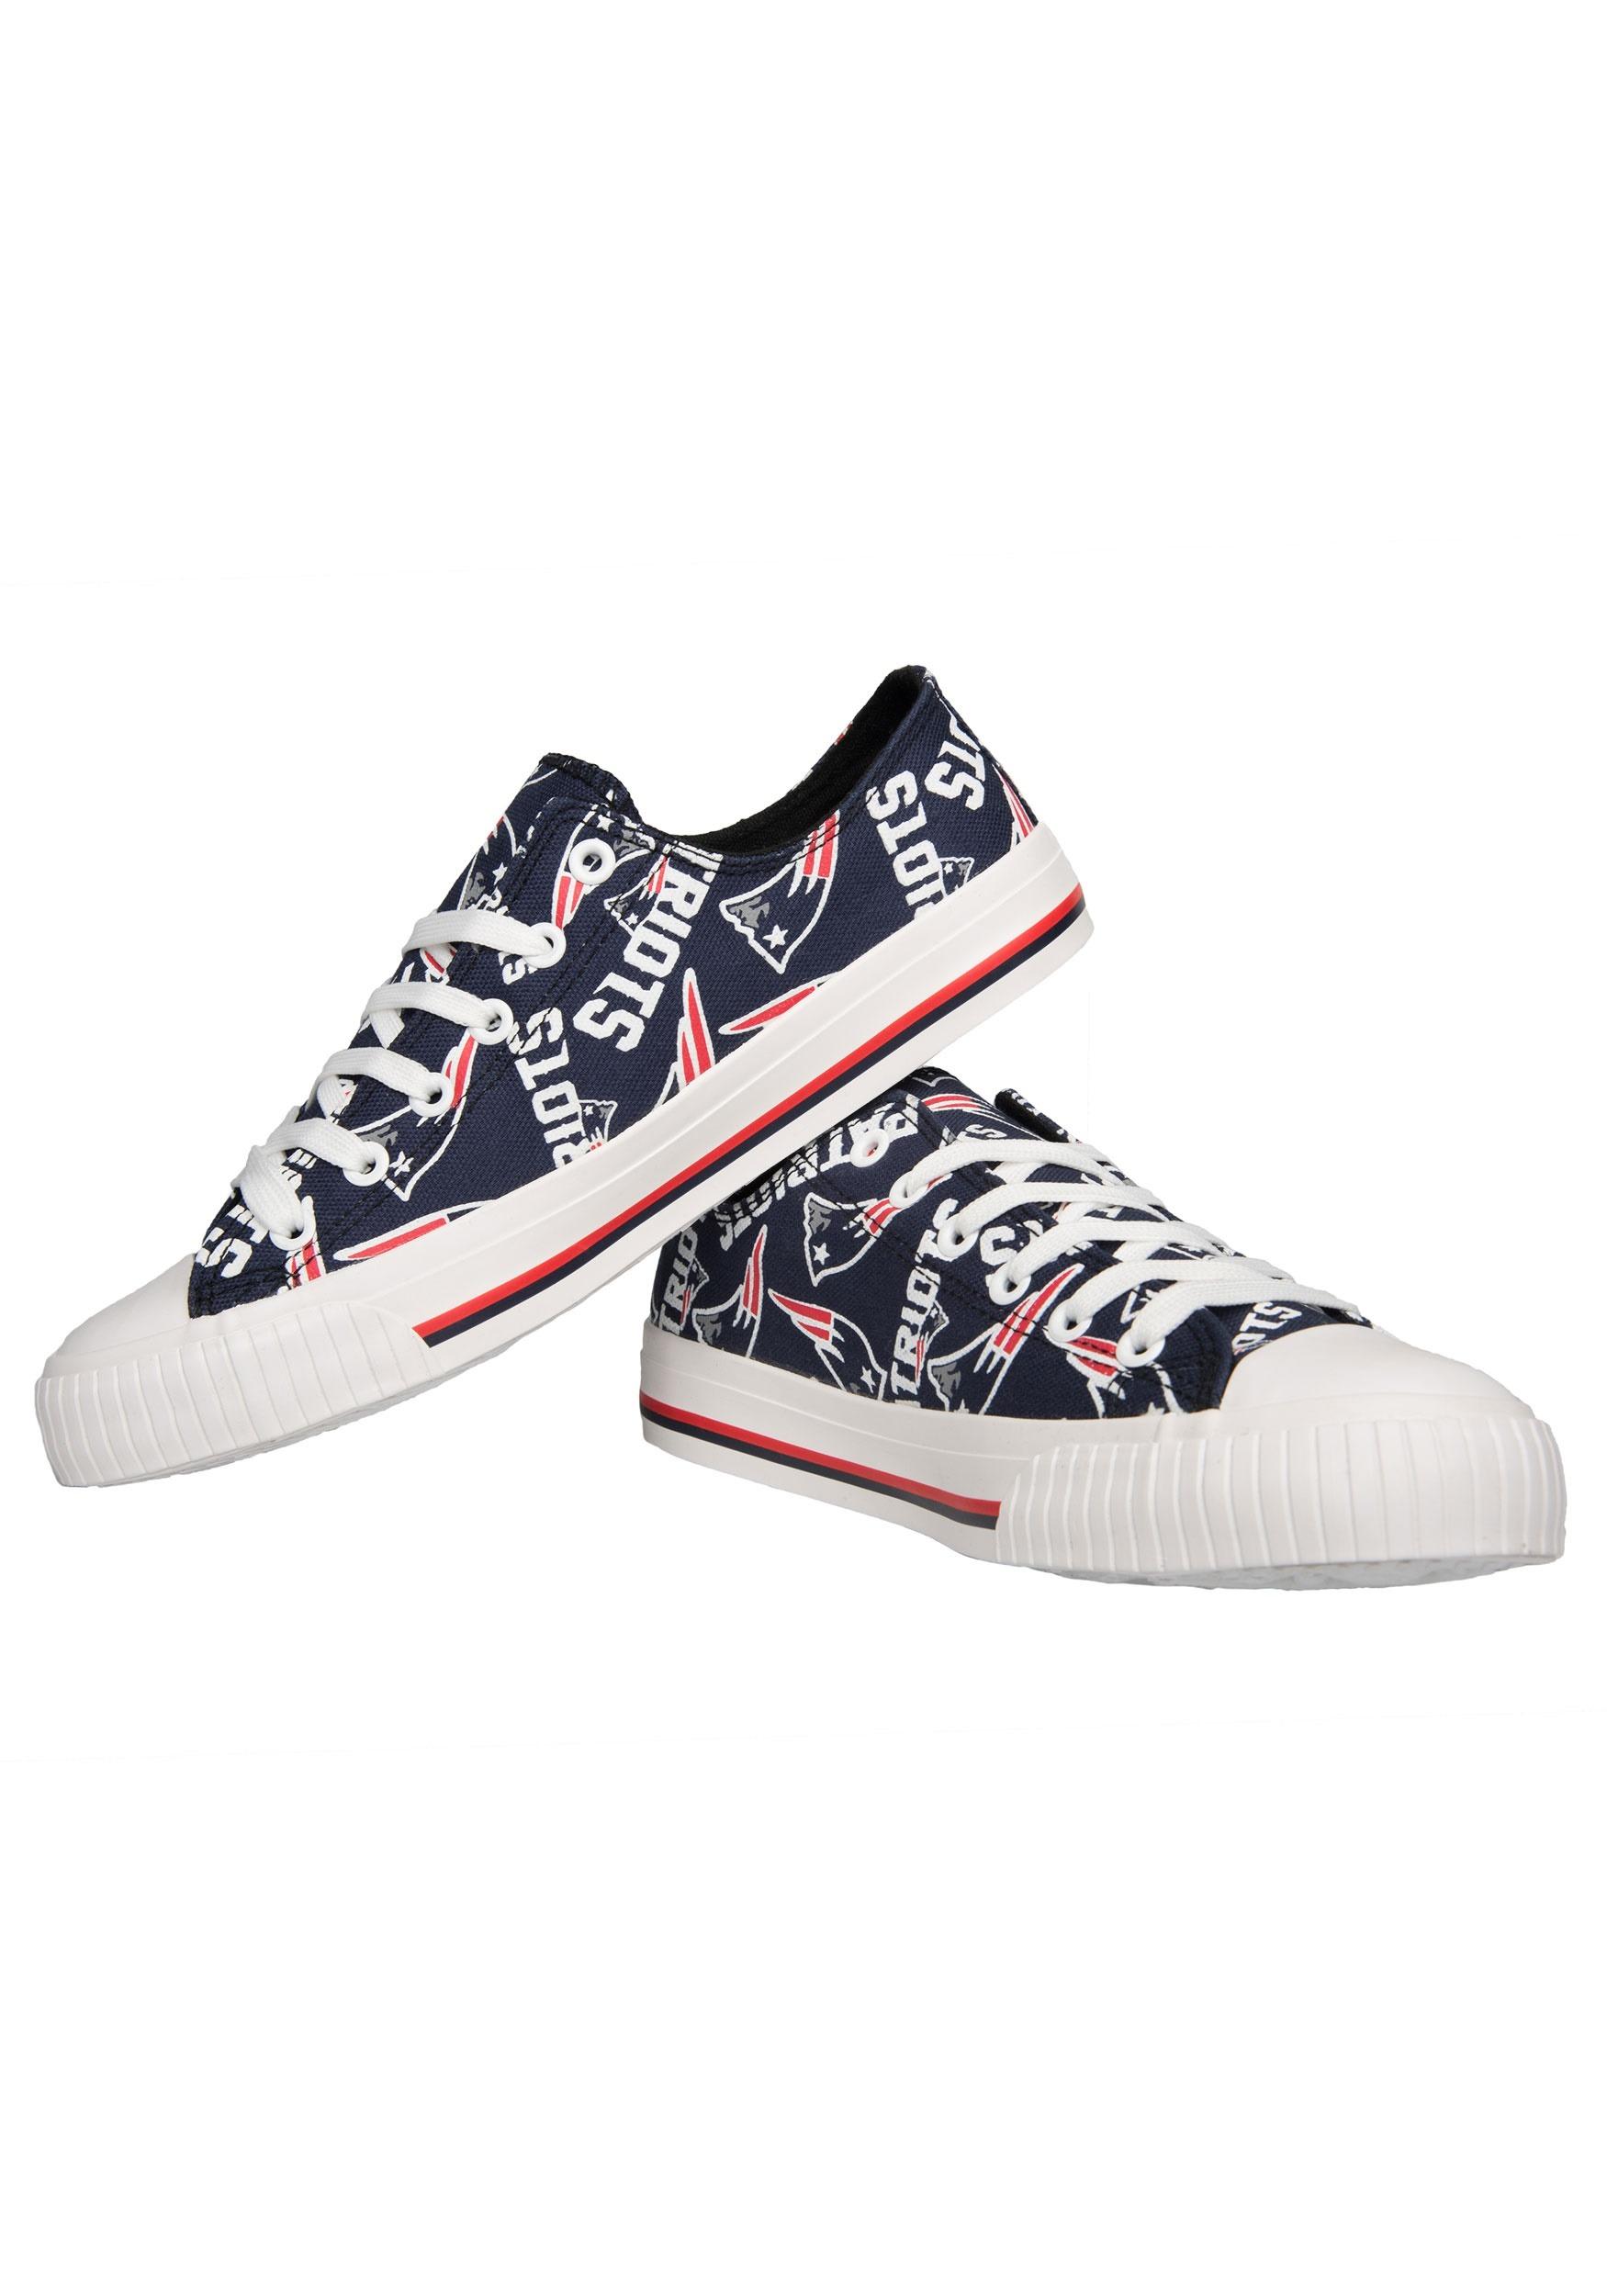 12d40a07d New England Patriots Low Top Canvas Shoes for Women